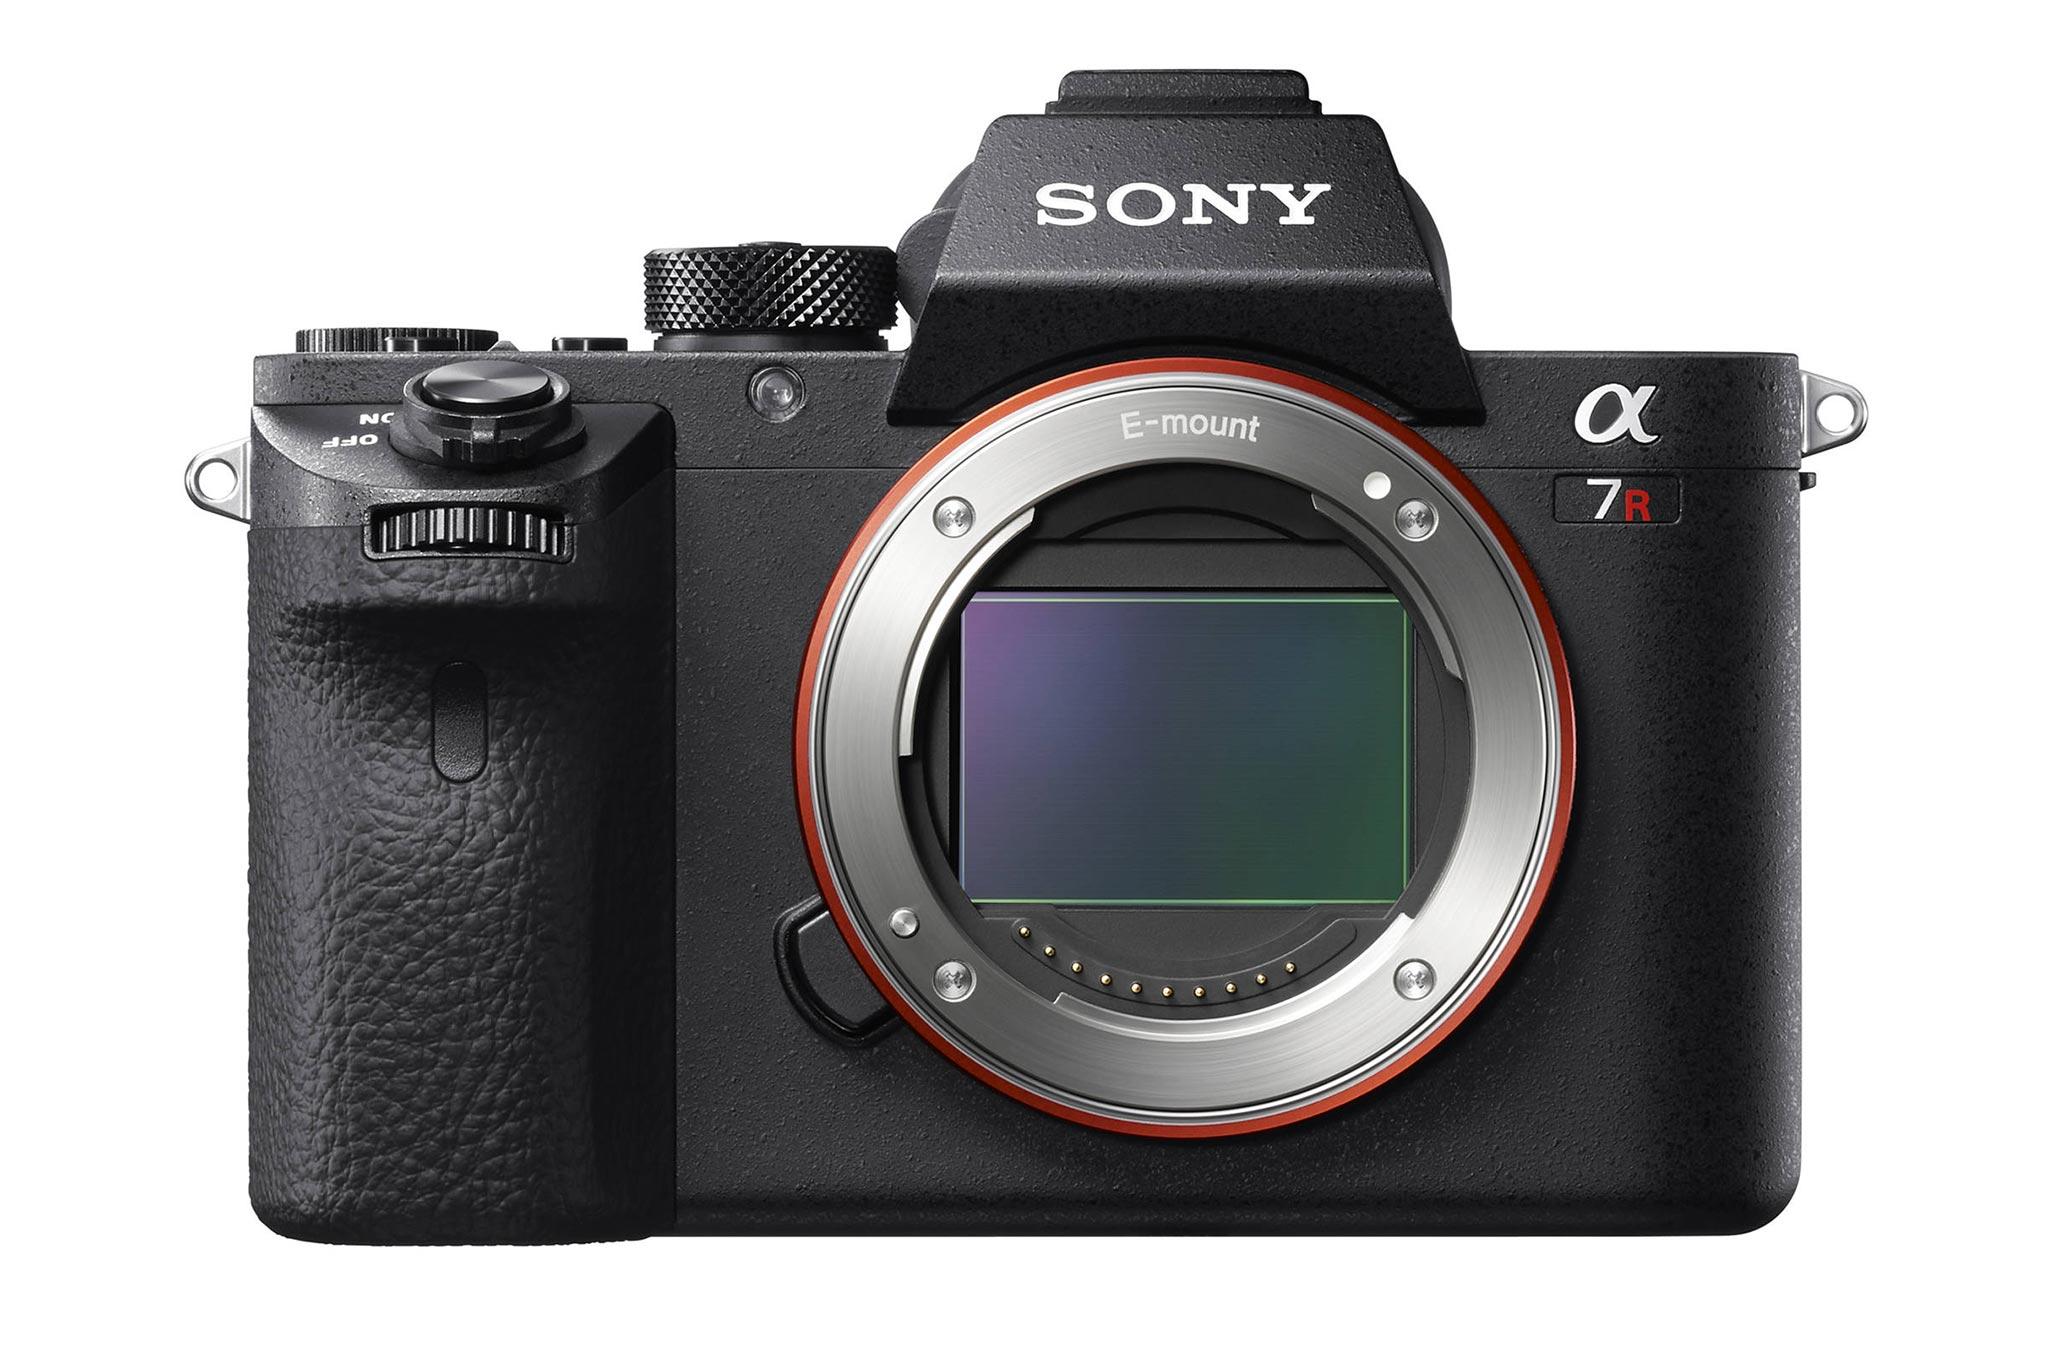 Sony_A7R_II_top_tinhte.jpg